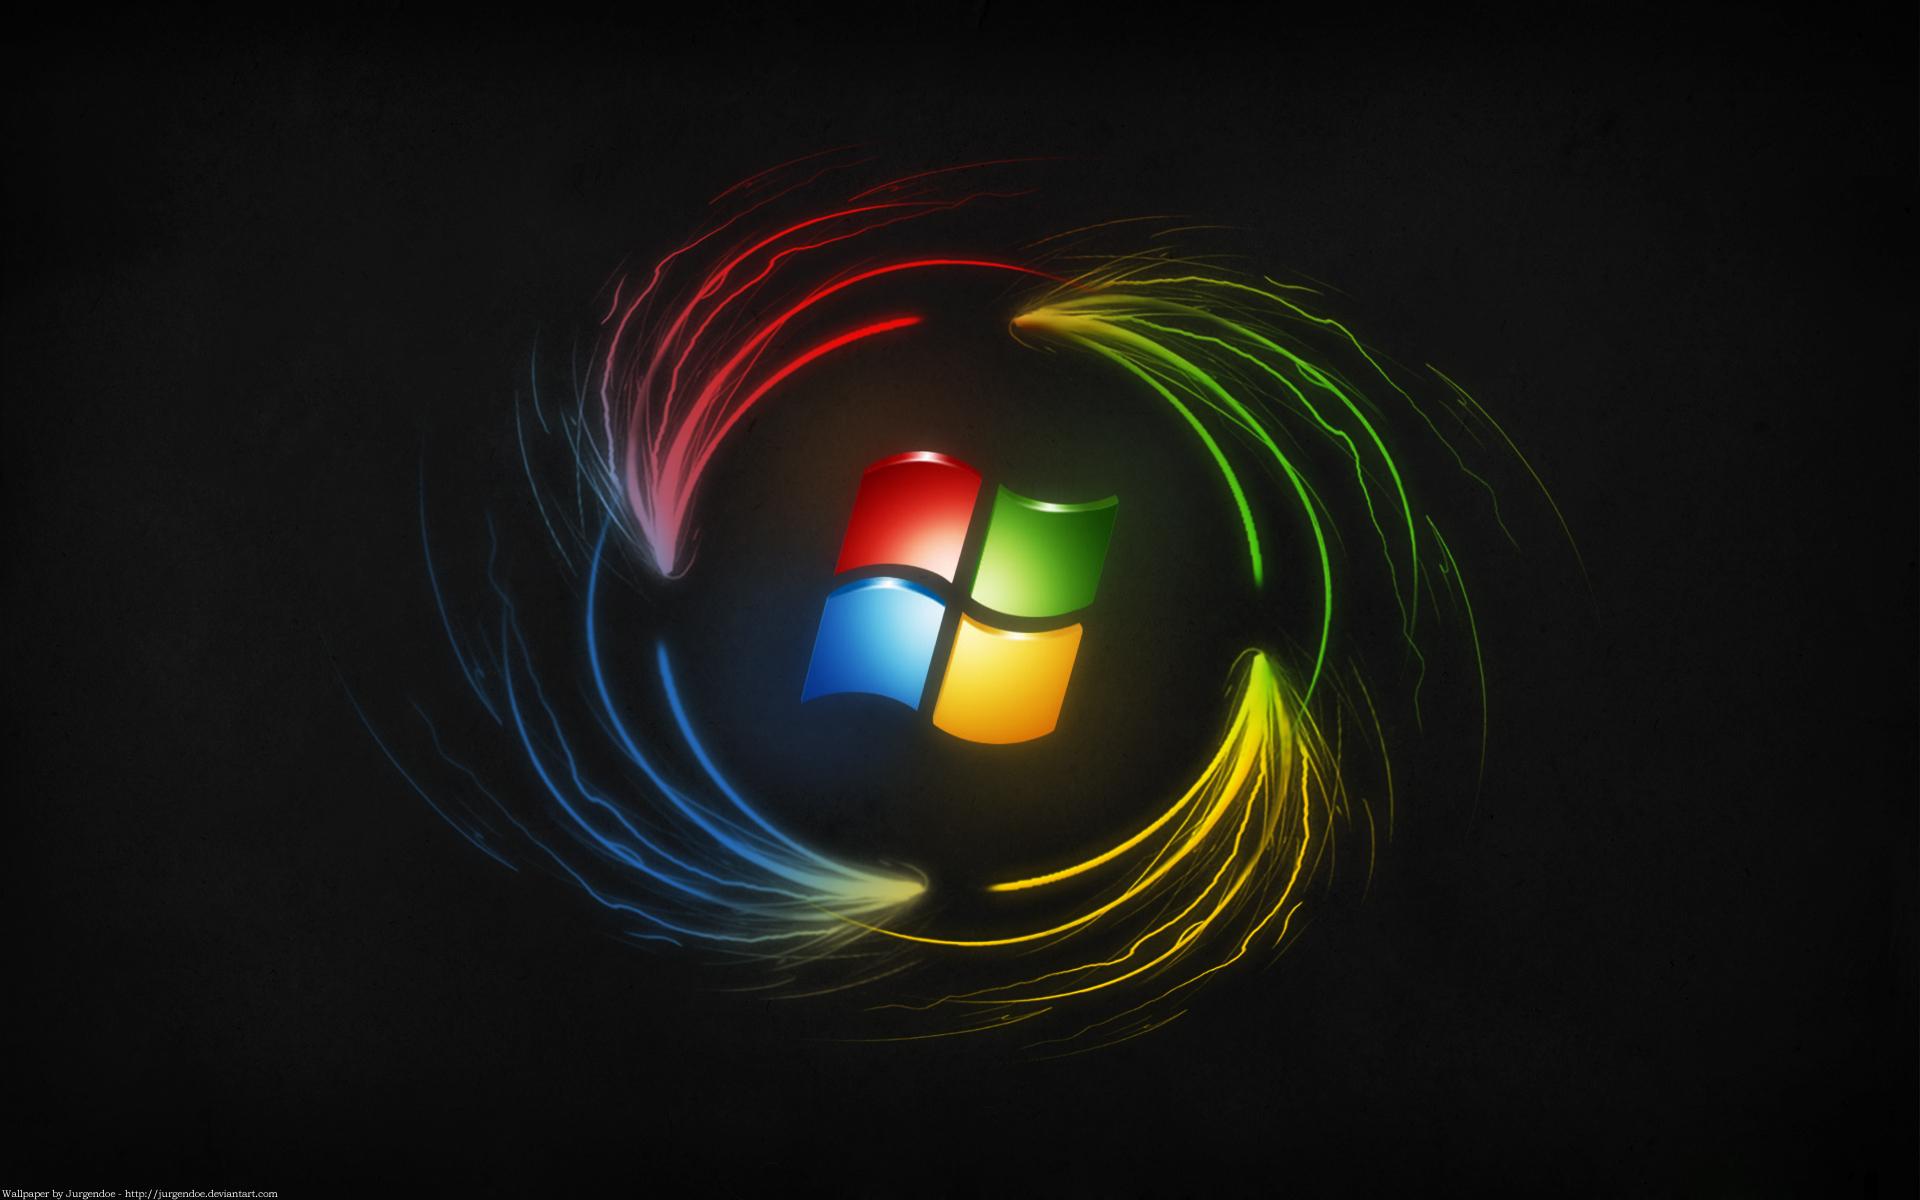 swirly background for windows 8